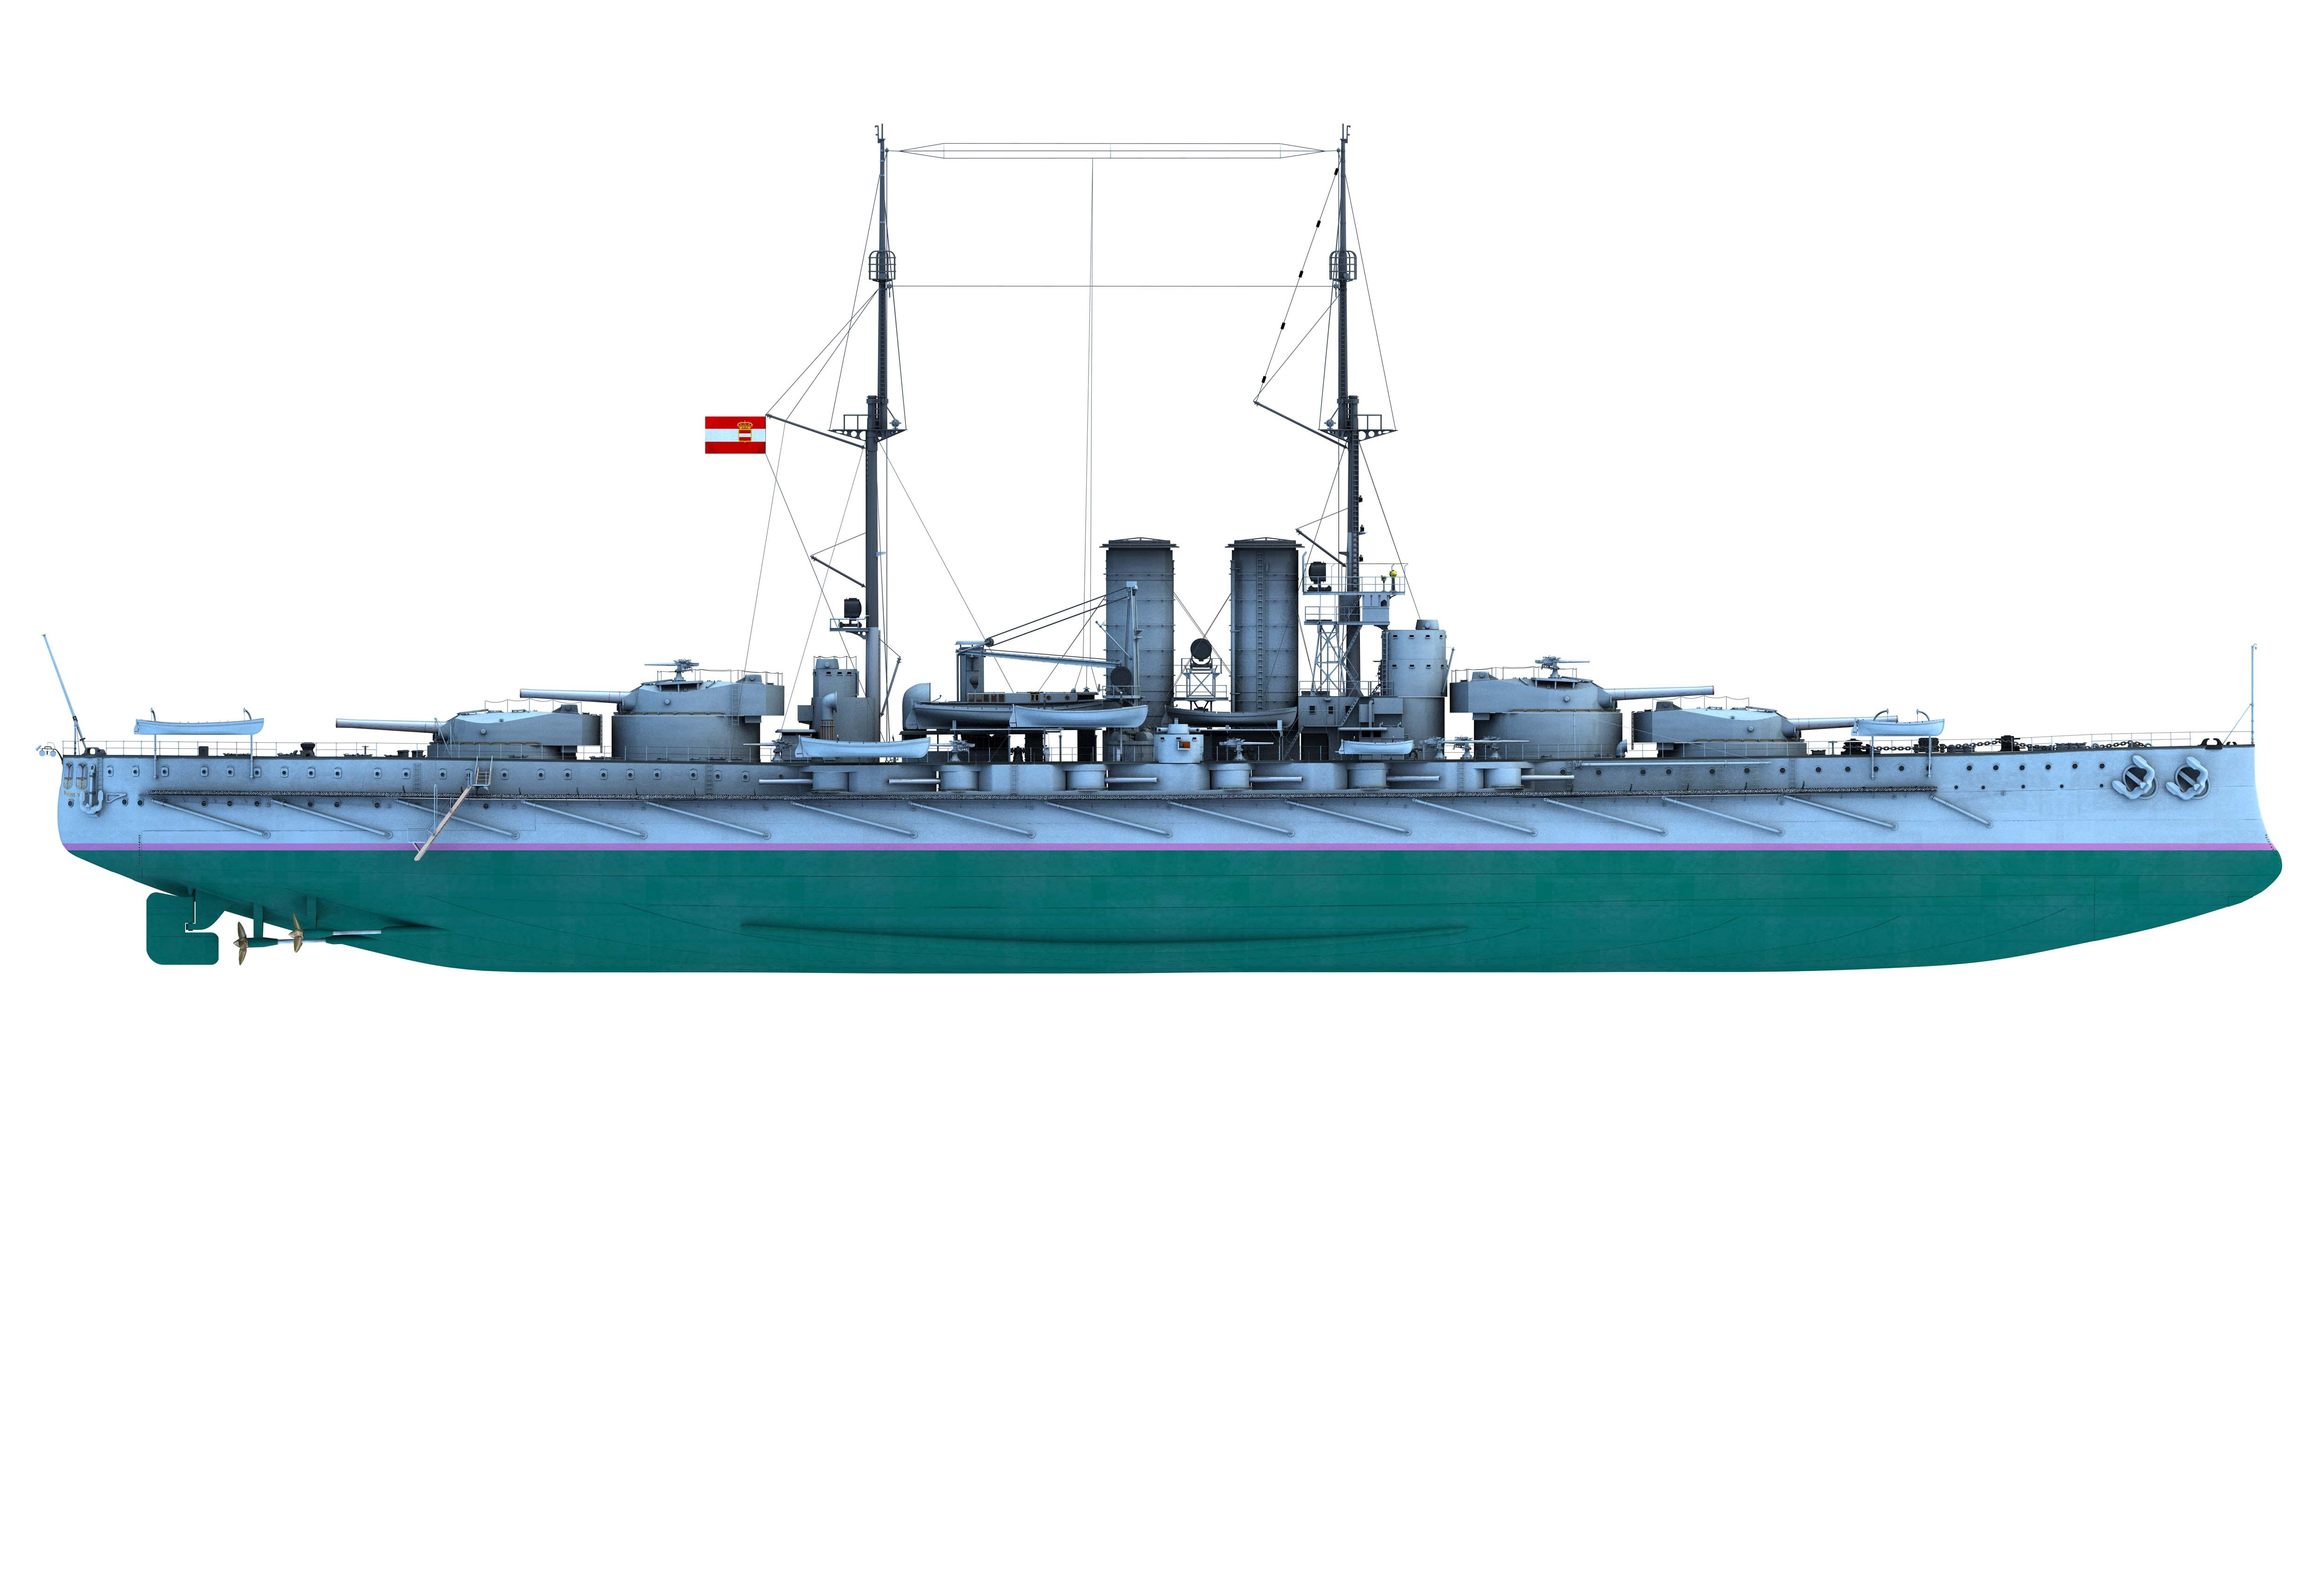 https://0901.nccdn.net/4_2/000/000/008/486/CK85-Profile-Starboard-5000x3388.jpg